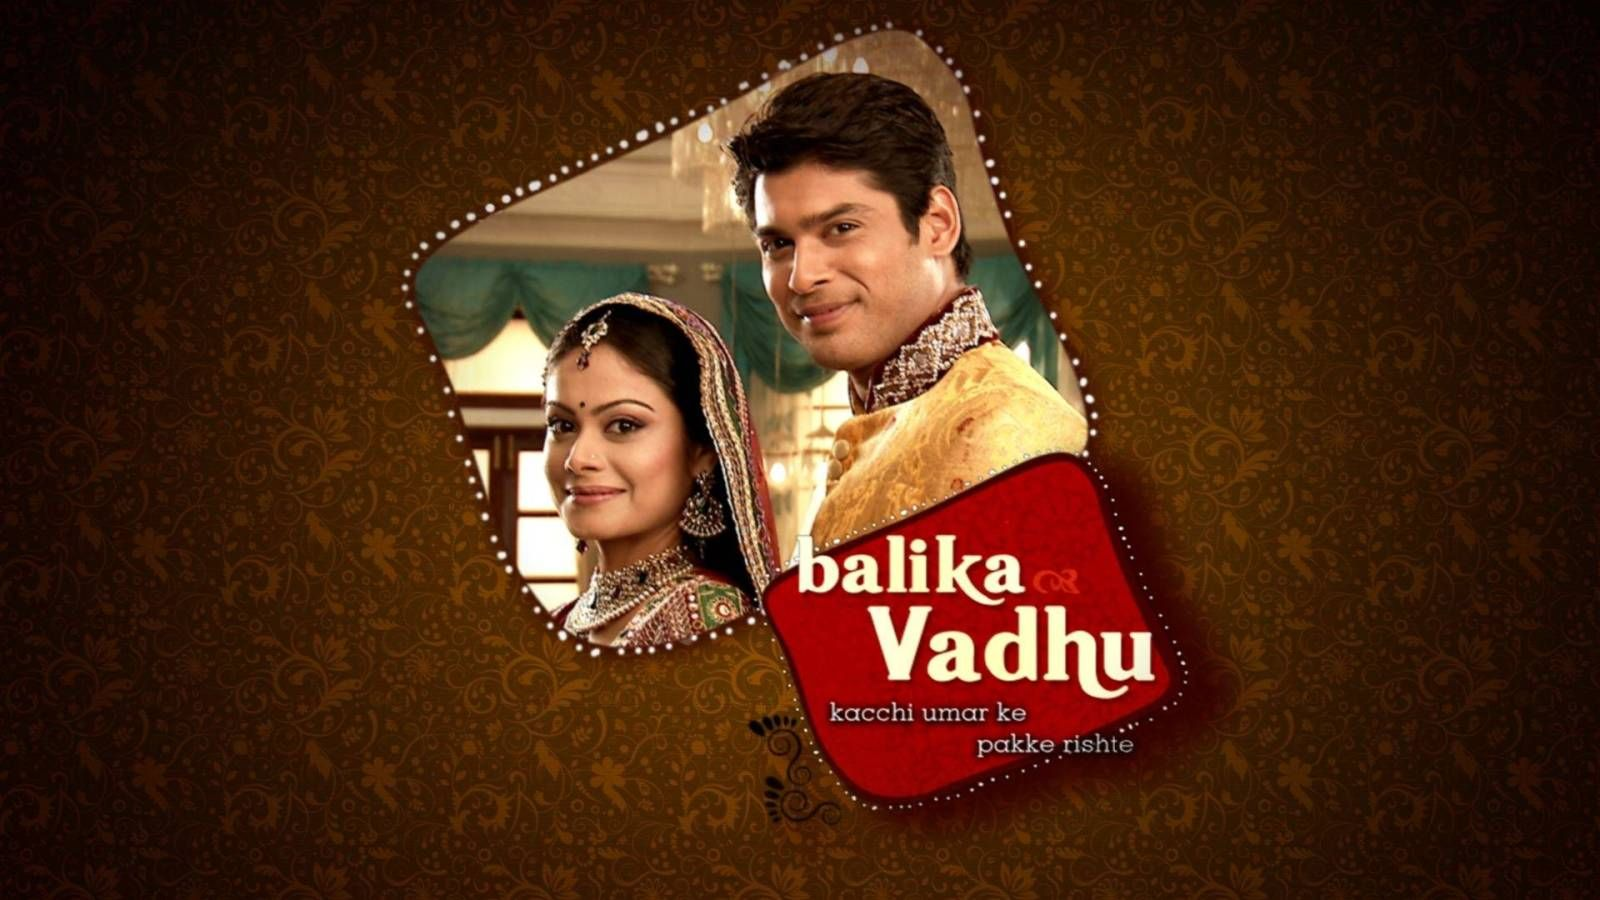 Balika Vadhu Balika Vadhu Today Episode Balika Vadhu Live Serial